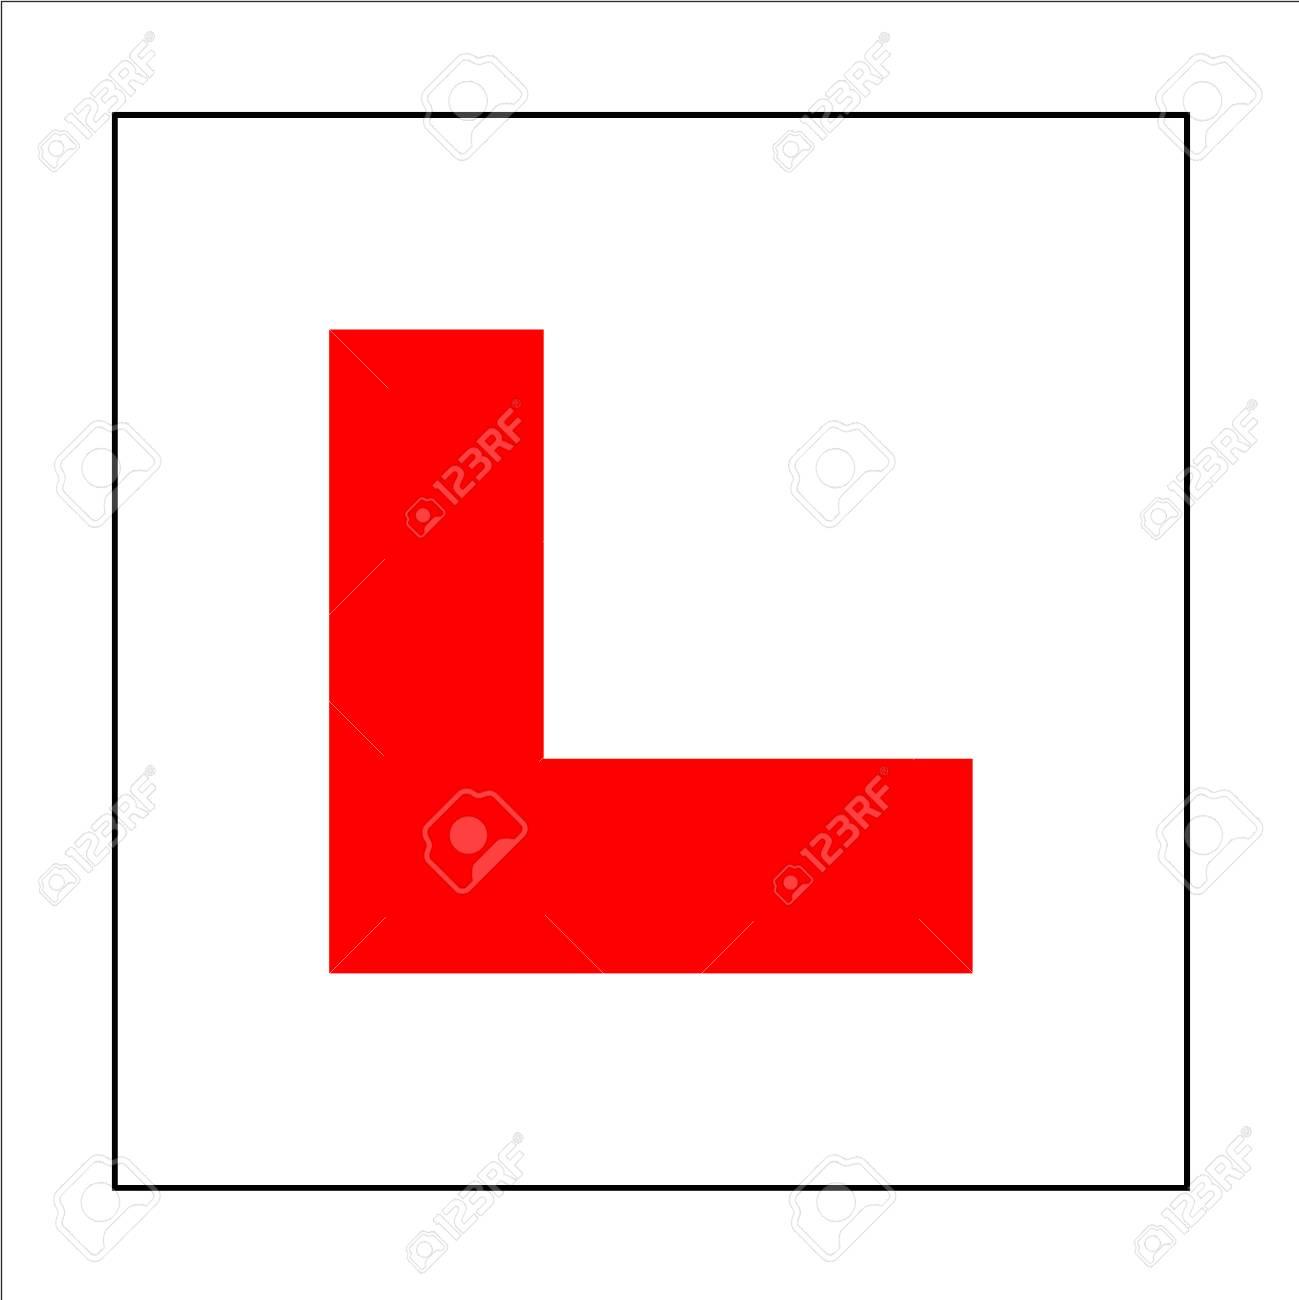 Learner driver plate sign. Car driving school beginner symbol. Red letter L on square white background sticker. - 88754631